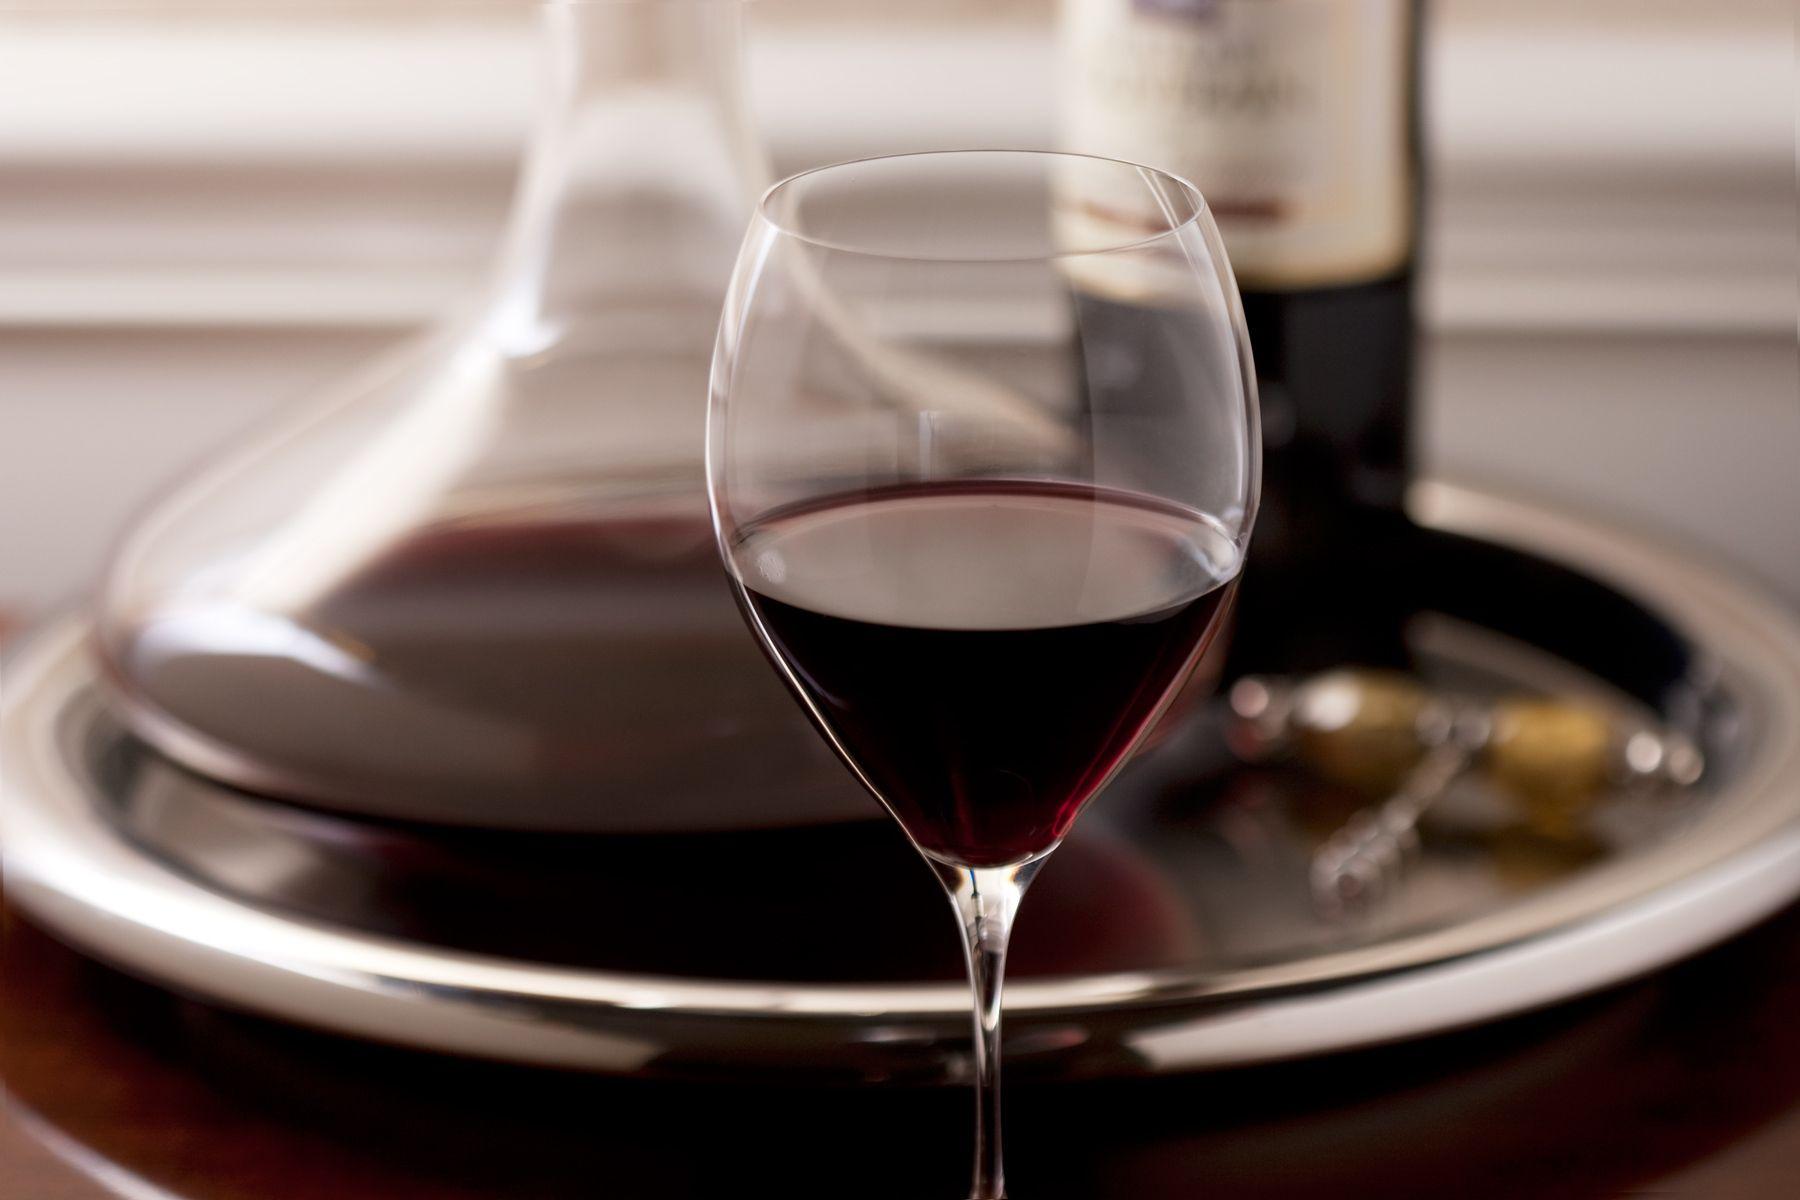 carafe of cabernet sauvignon